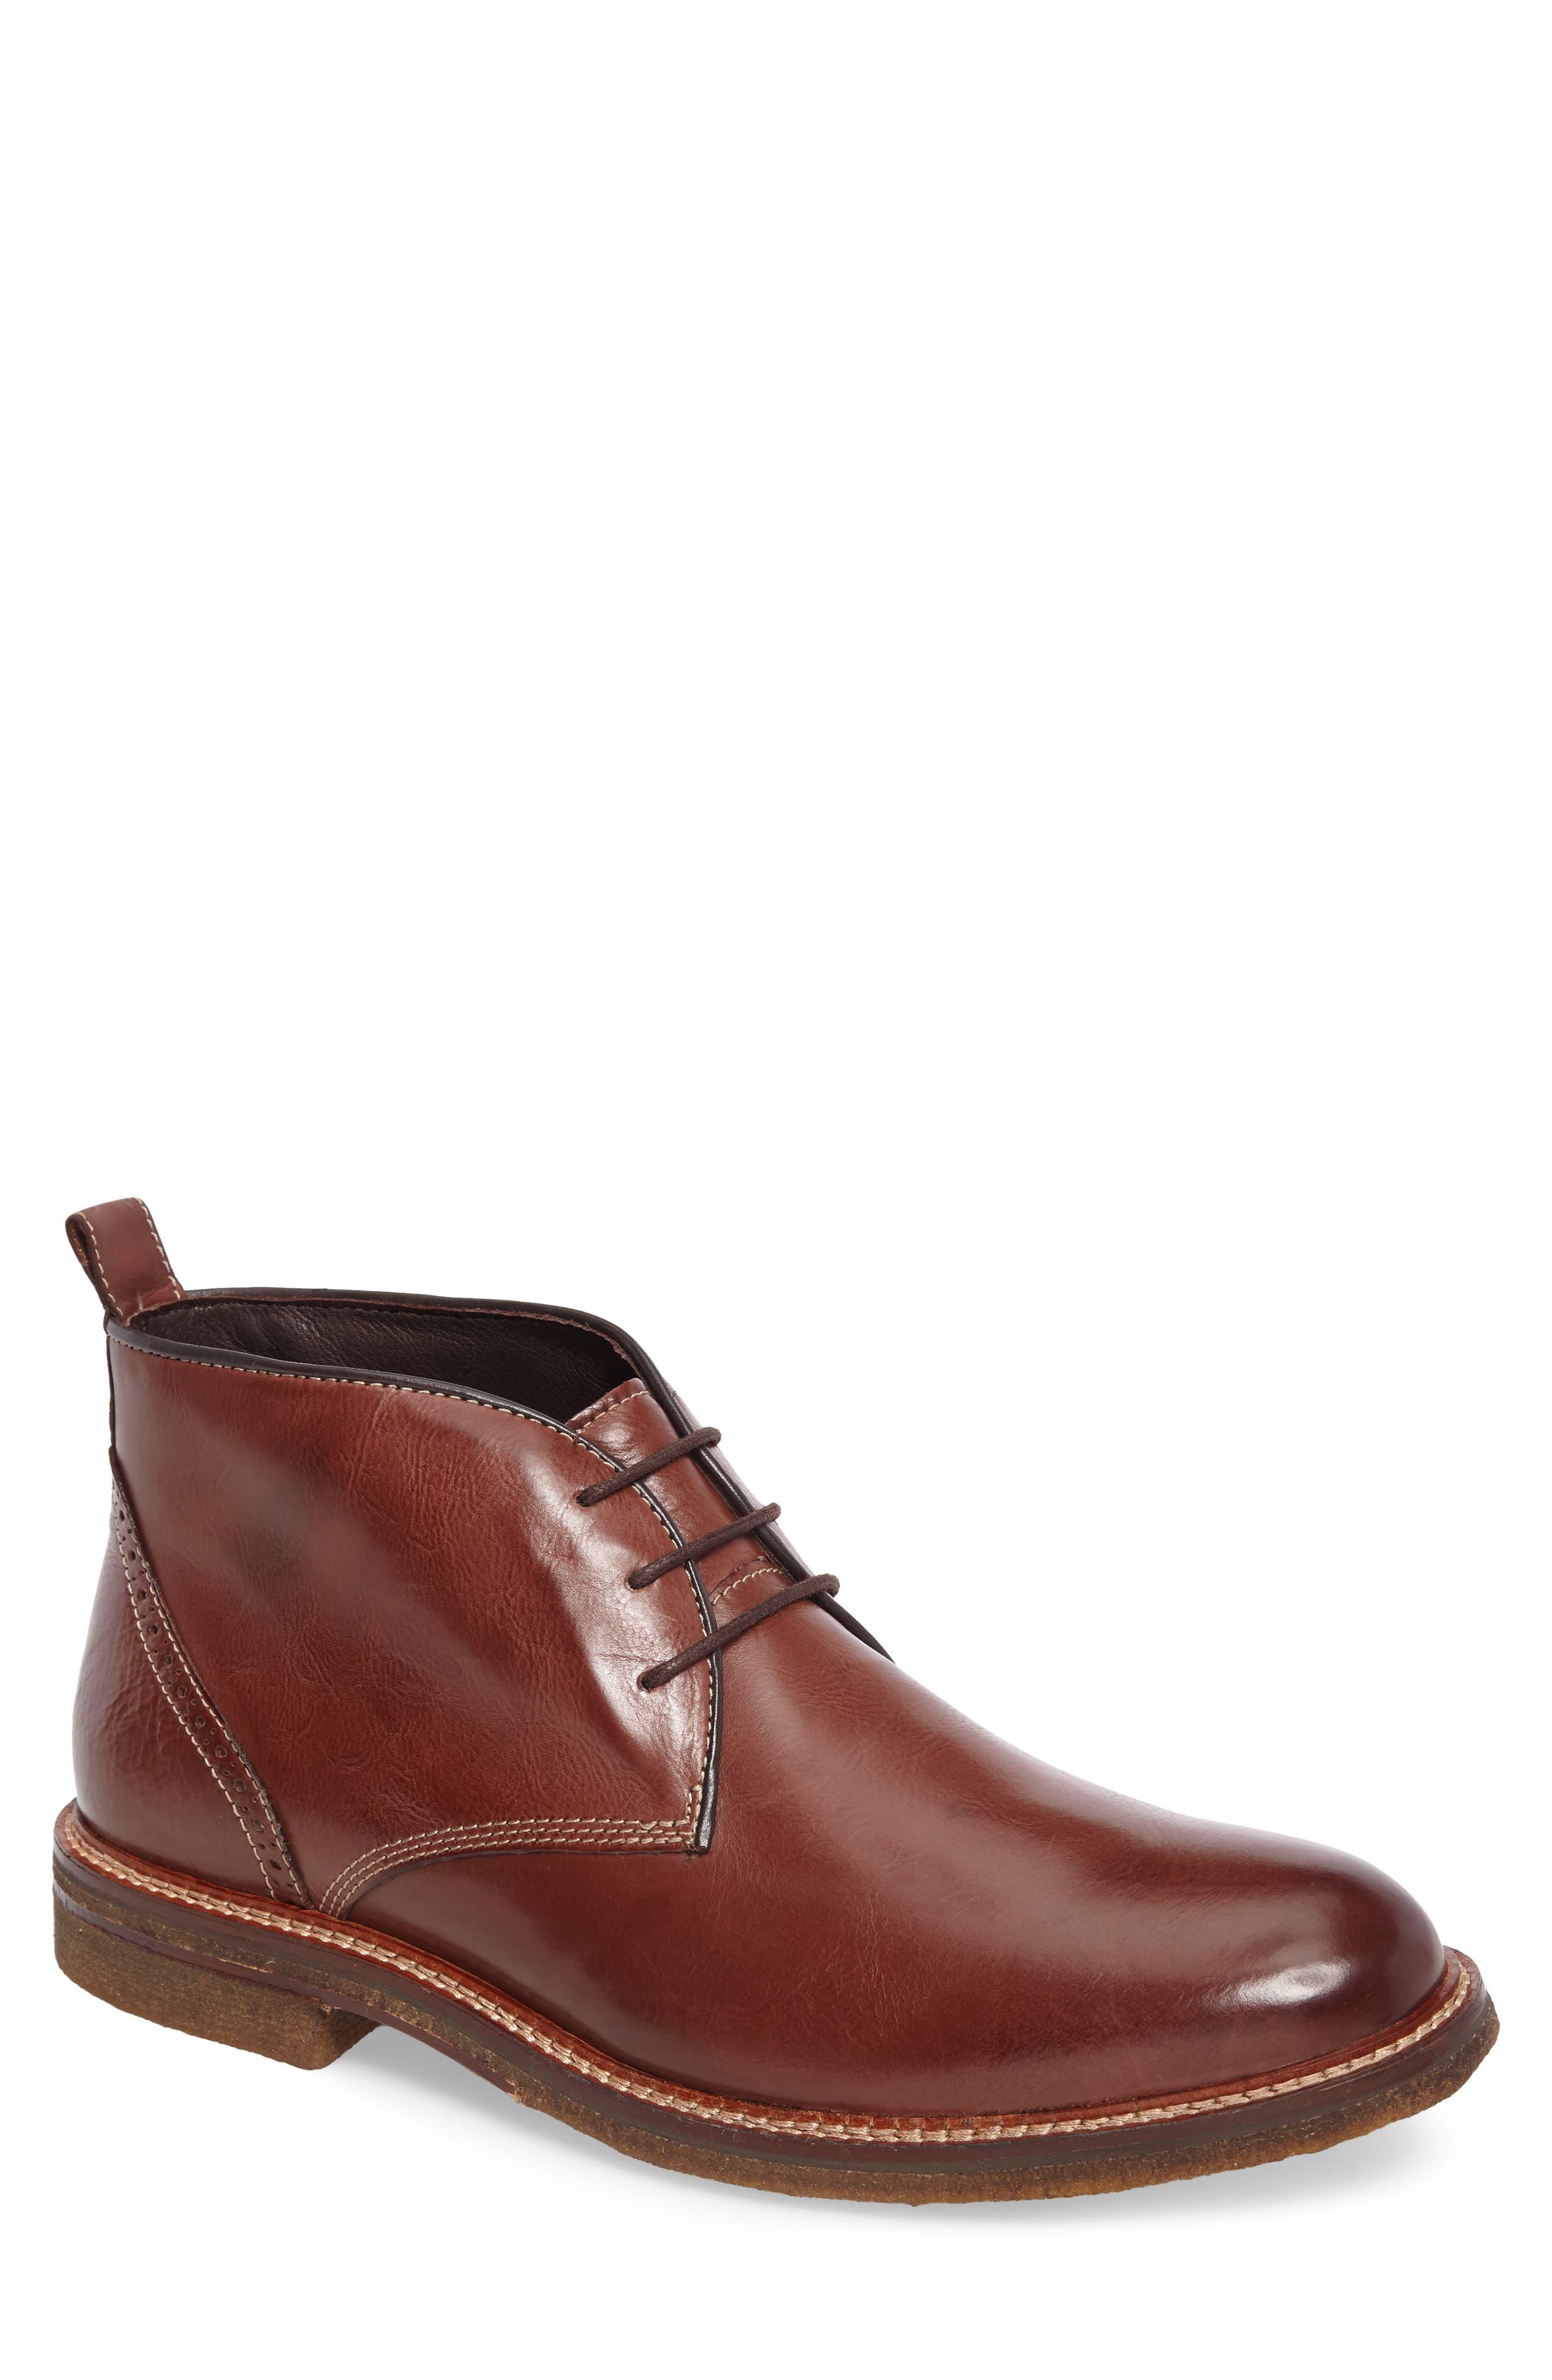 Forrester Chukka Boot,                         Main,                         color, MAHOGANY LEATHER